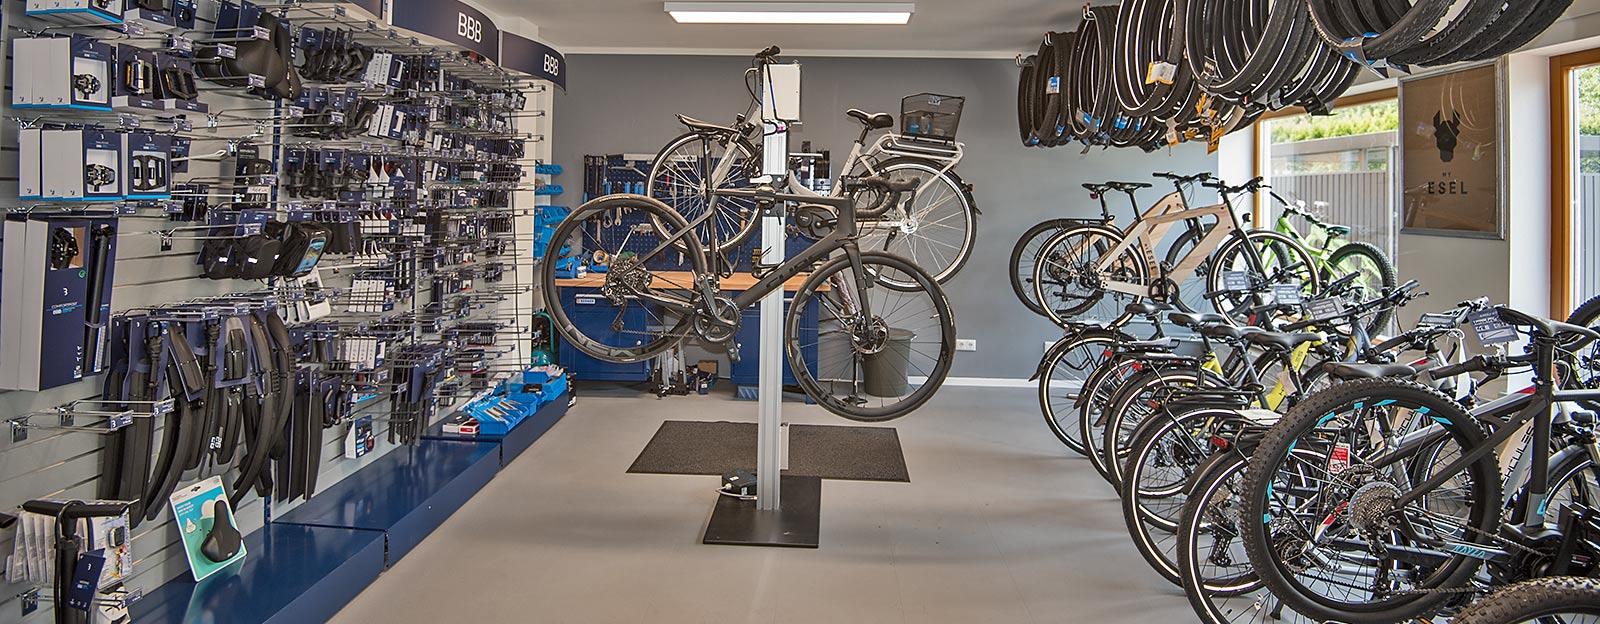 Fahrräder peter herbst